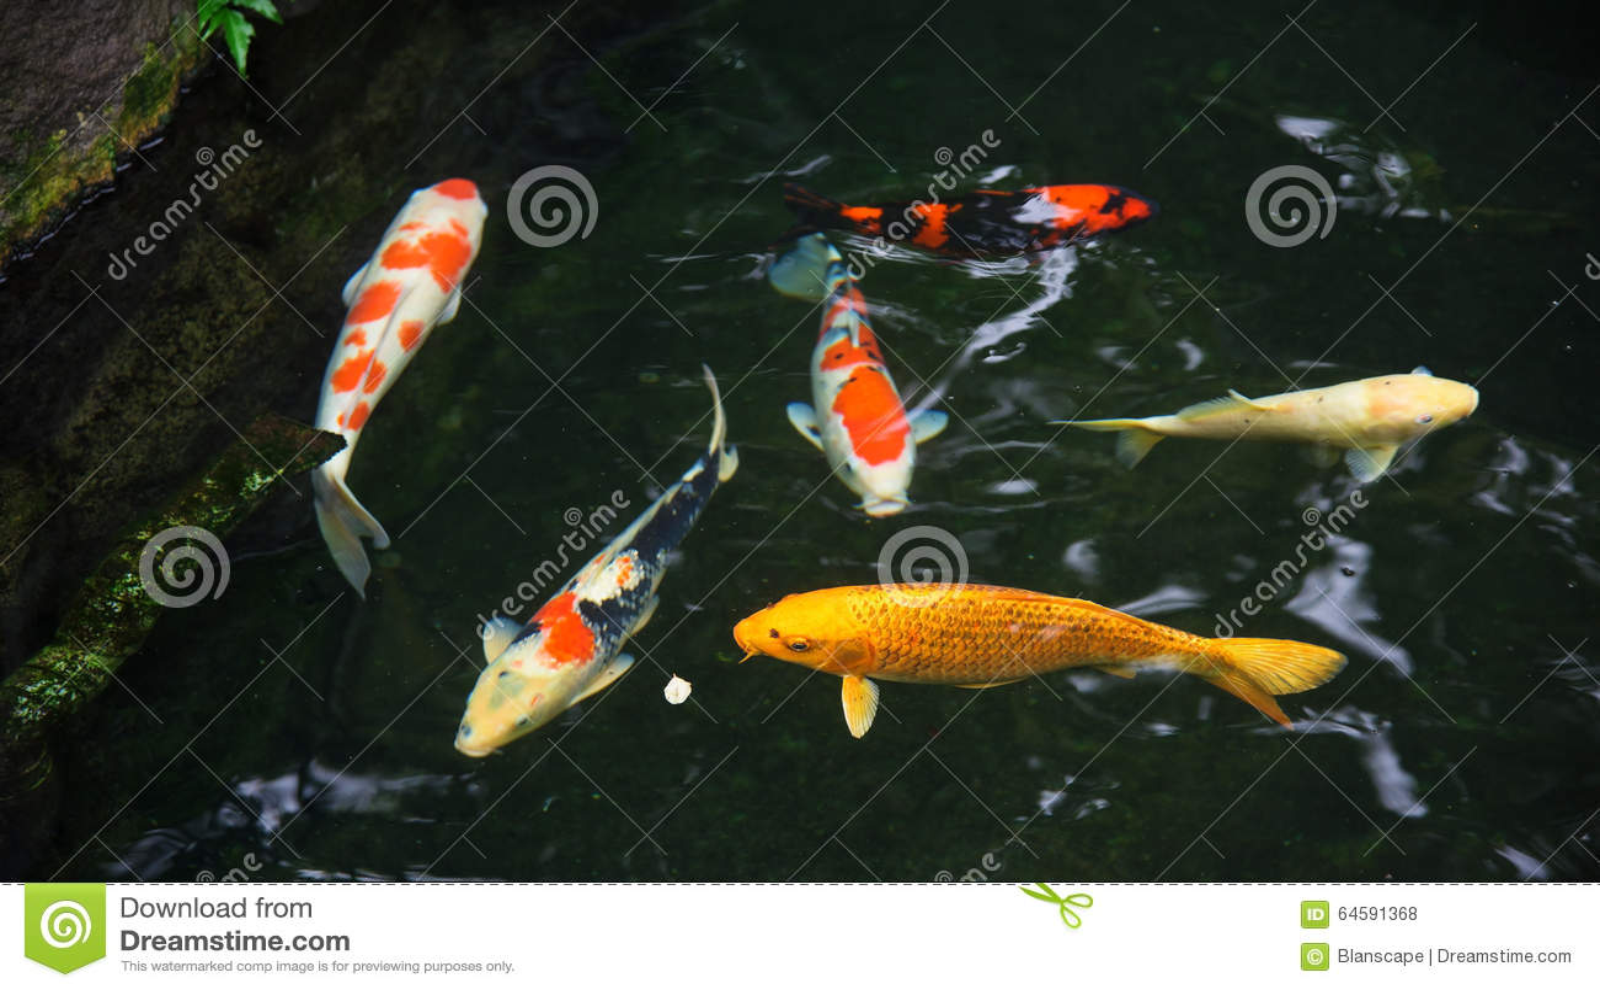 Feeding fancy carp fish stock photo for Koi fish dealers